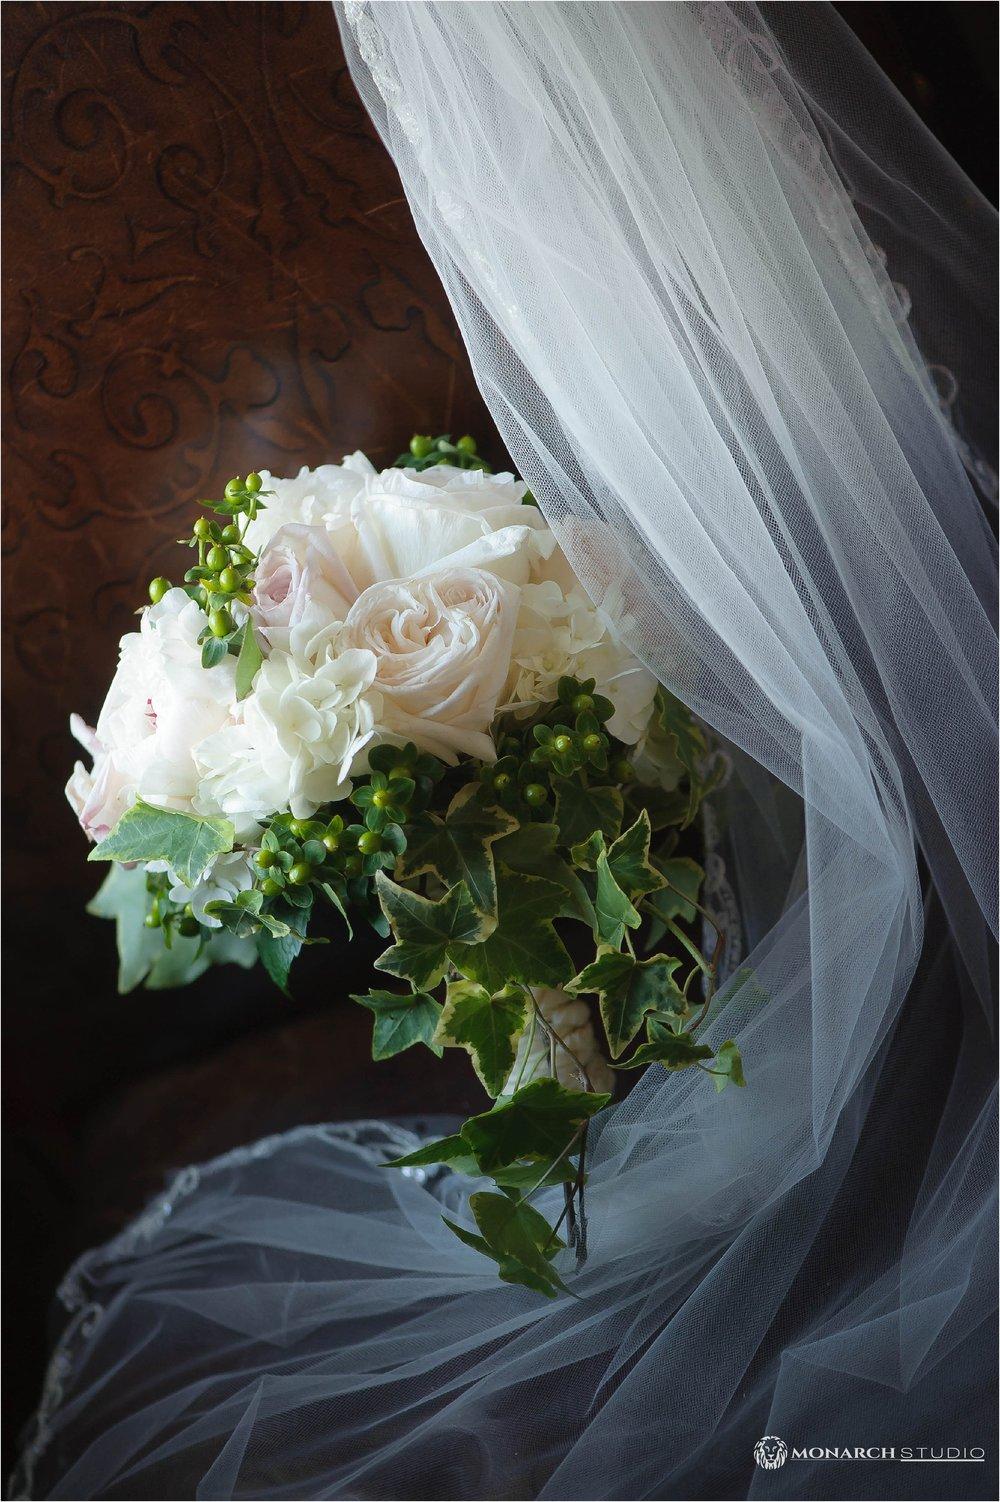 st-augustine-photographer-intimate-wedding-004.jpg